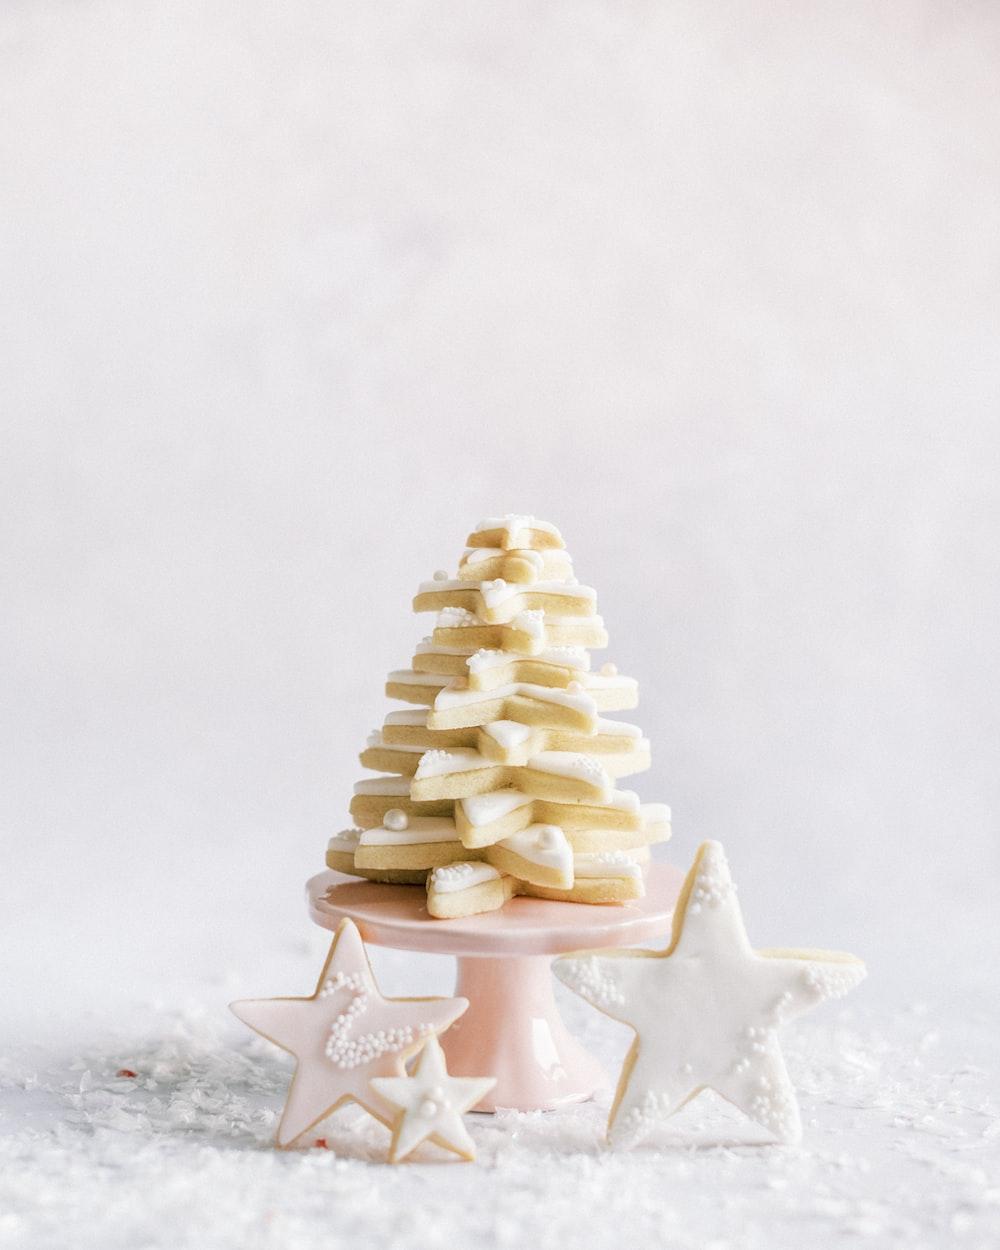 white ice cream cone on white ice cream cone